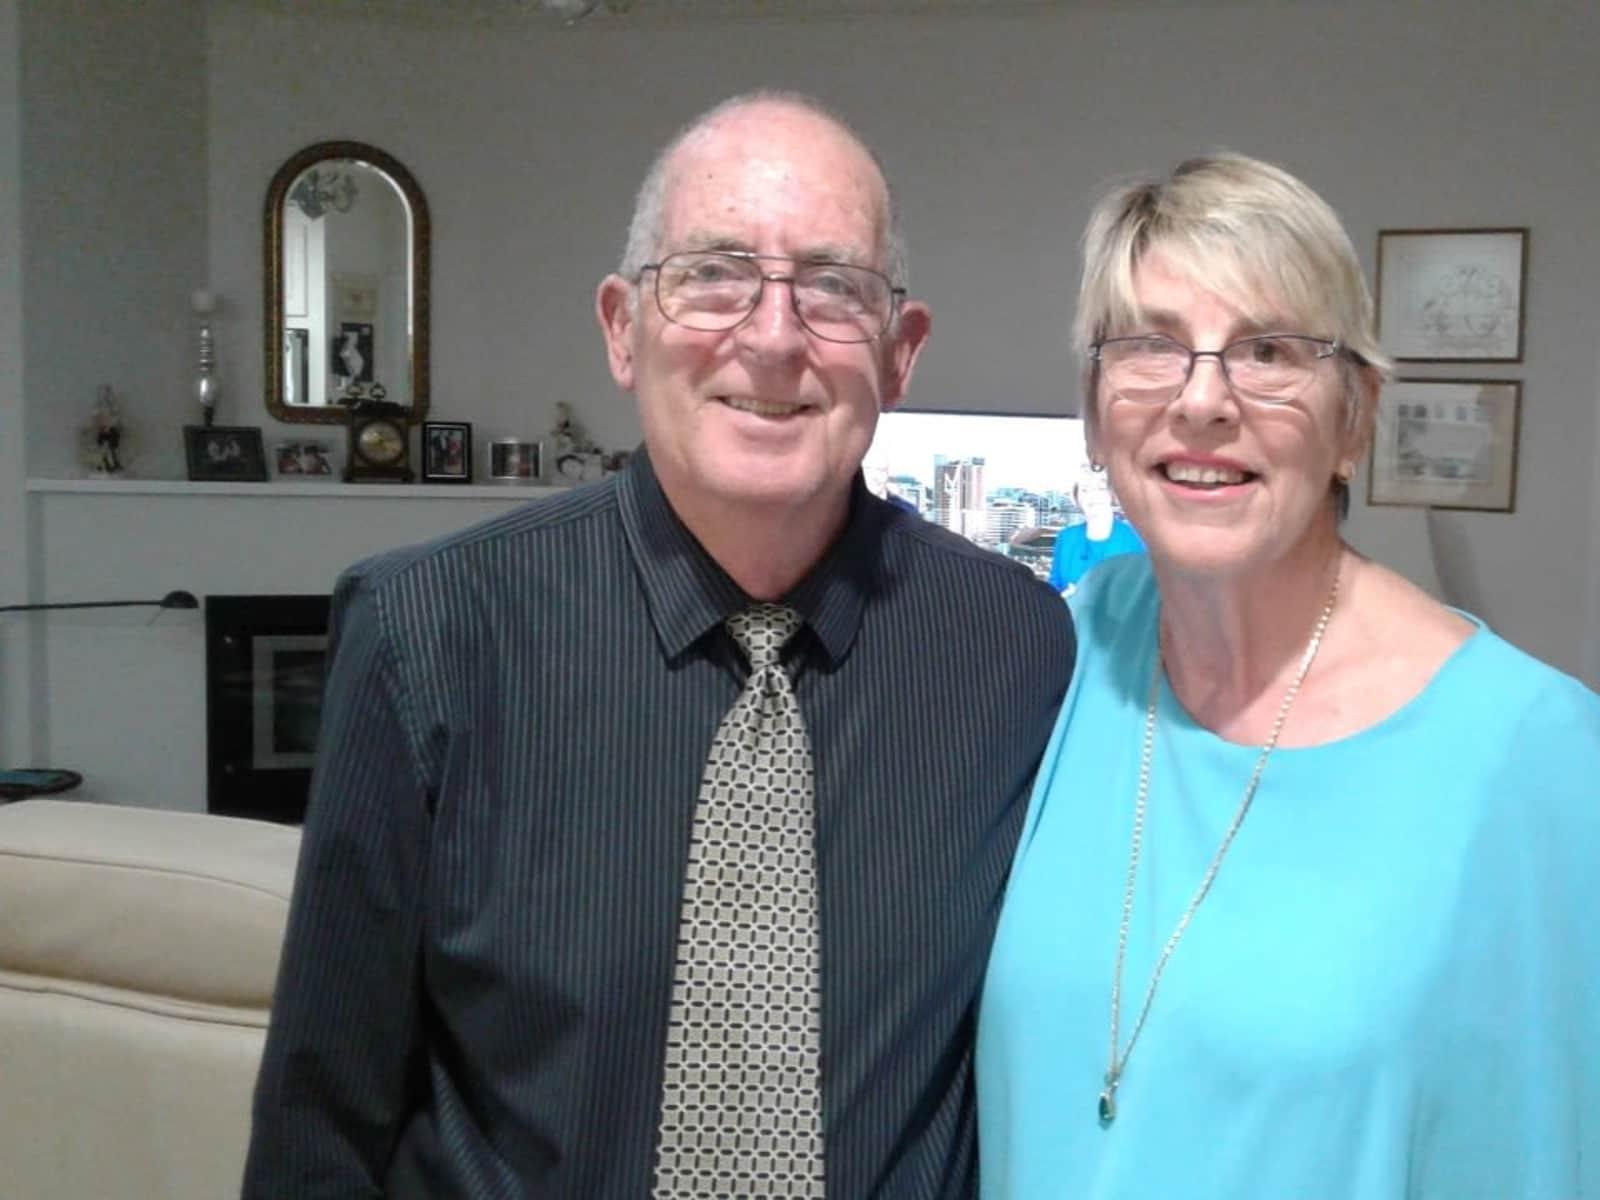 Ian & Jill from Adelaide, South Australia, Australia